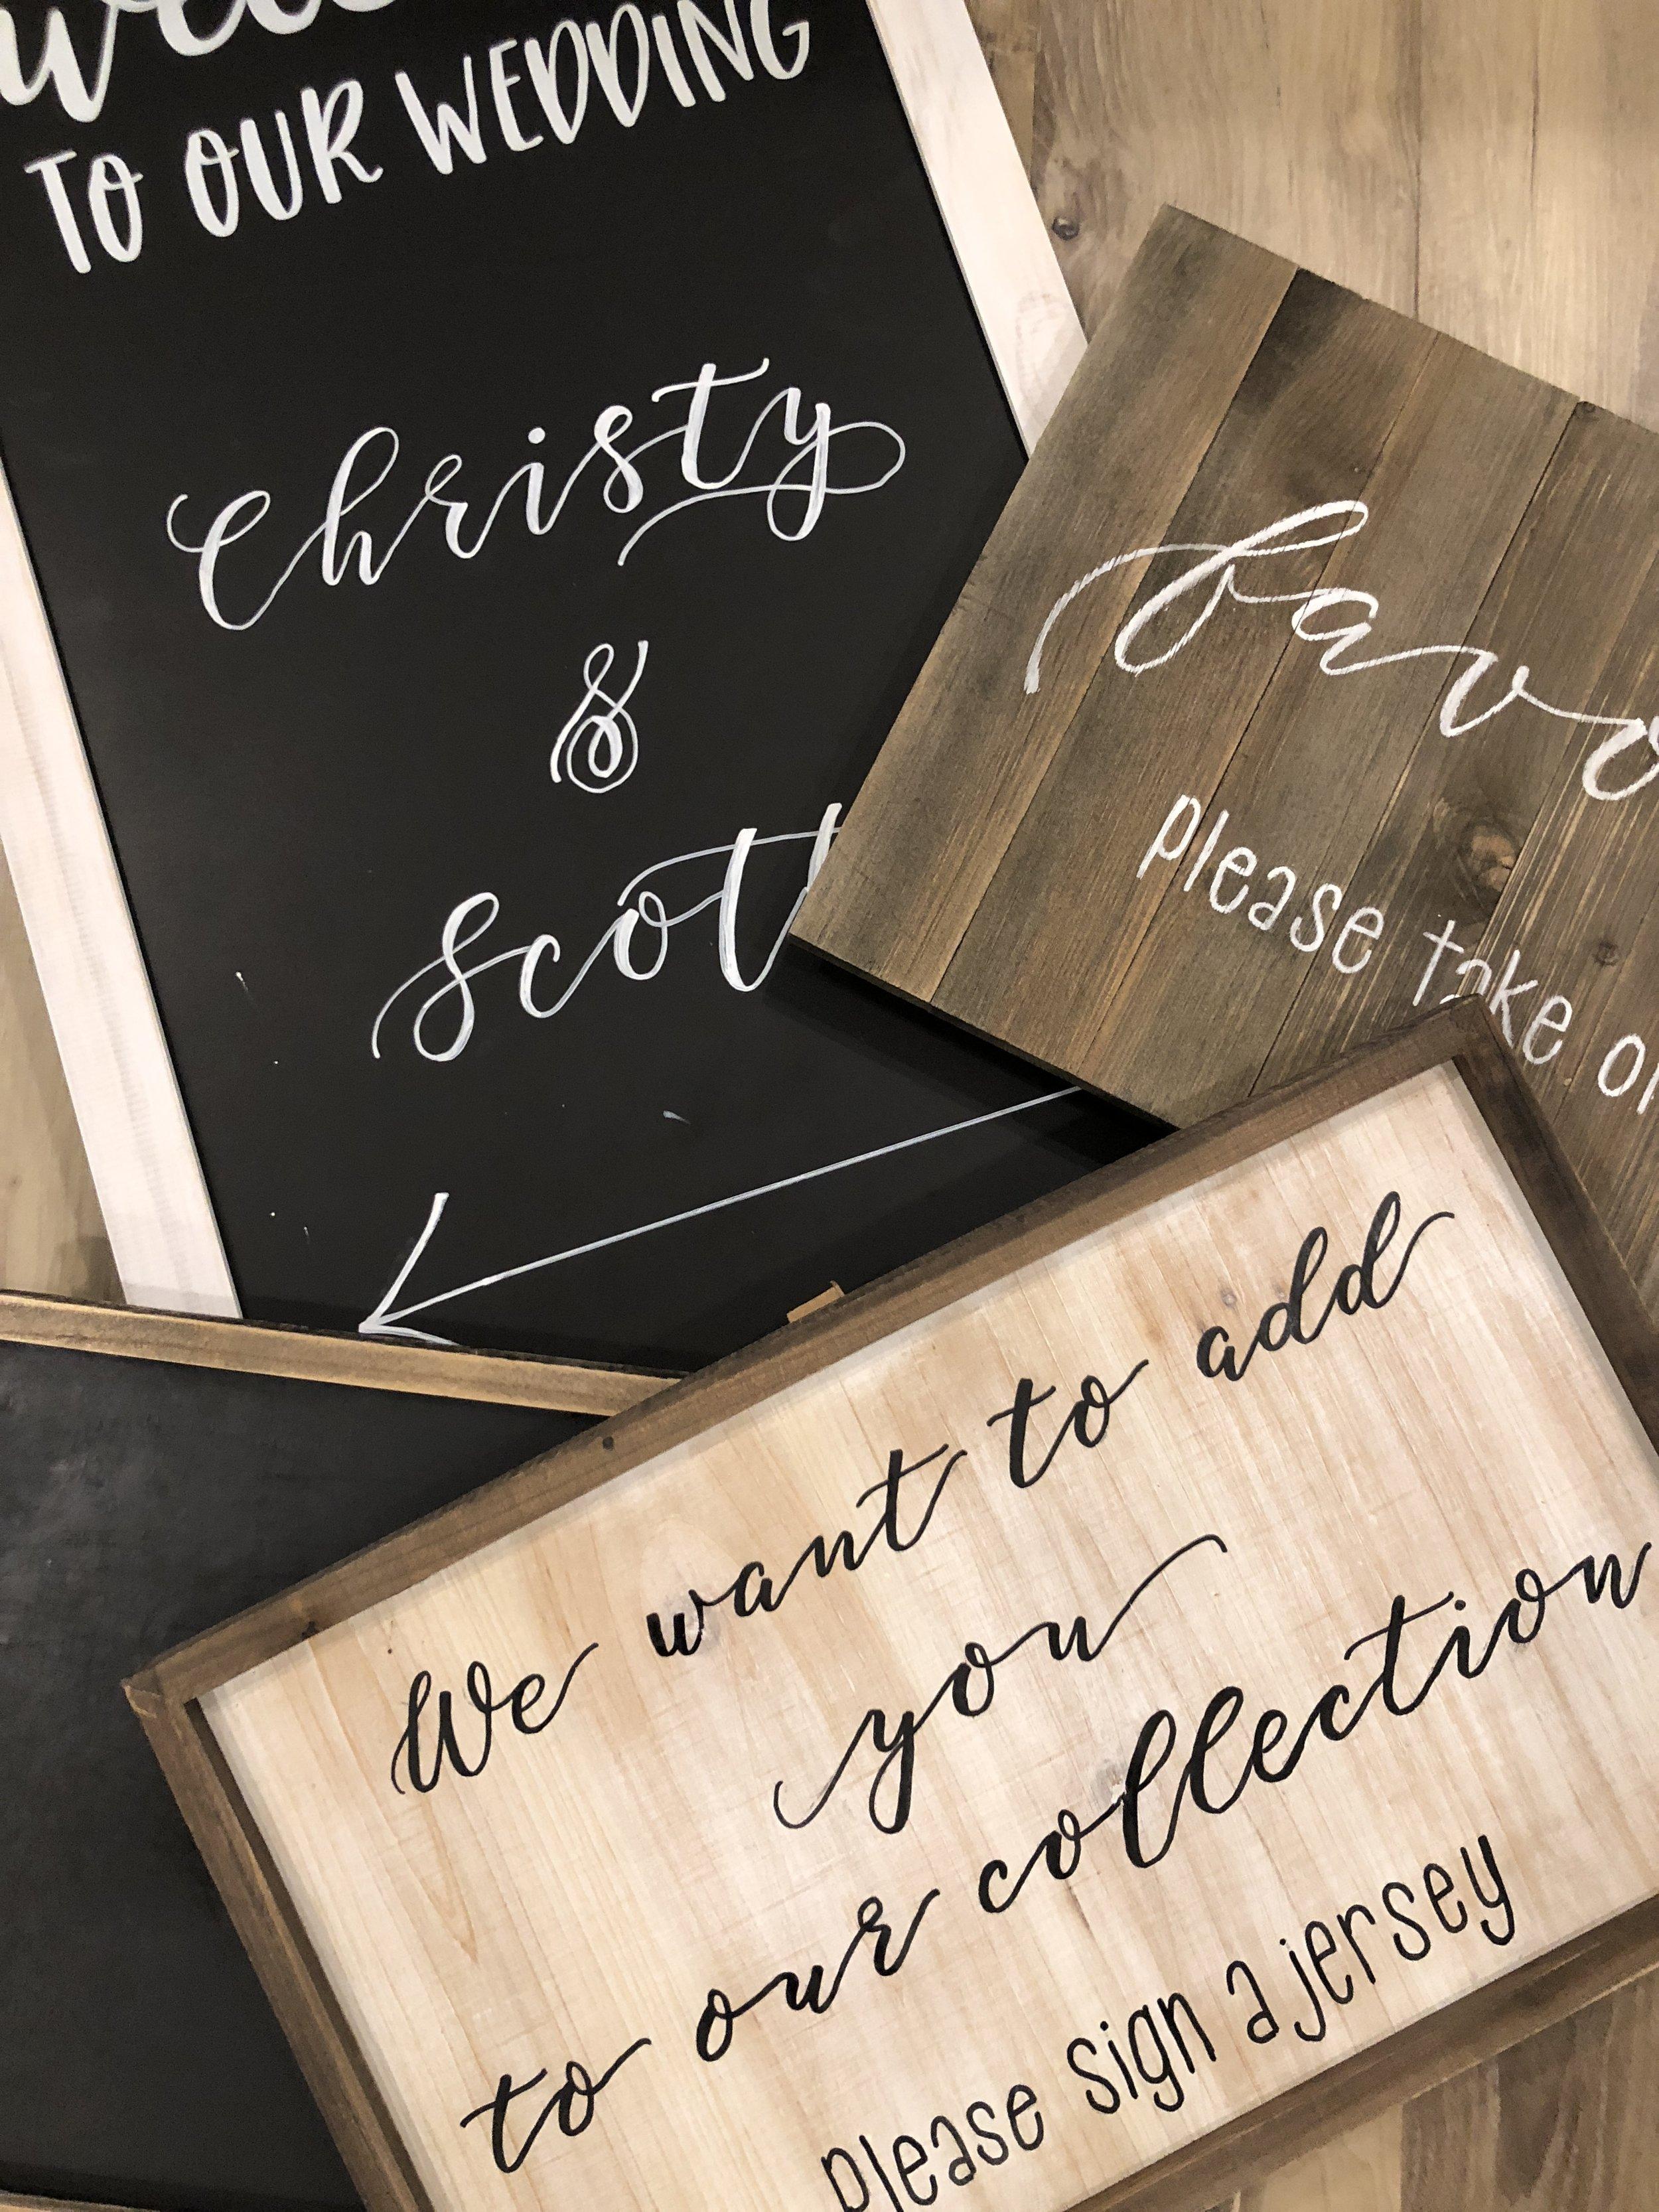 Central PA, York PA, JesSmith Designs, custom, wedding, invitations, bridal, Harrisburg, hanover, calligraphy, baltimore, wedding invitations, lancaster, gettysburg, 08-12 15.21.07.jpg